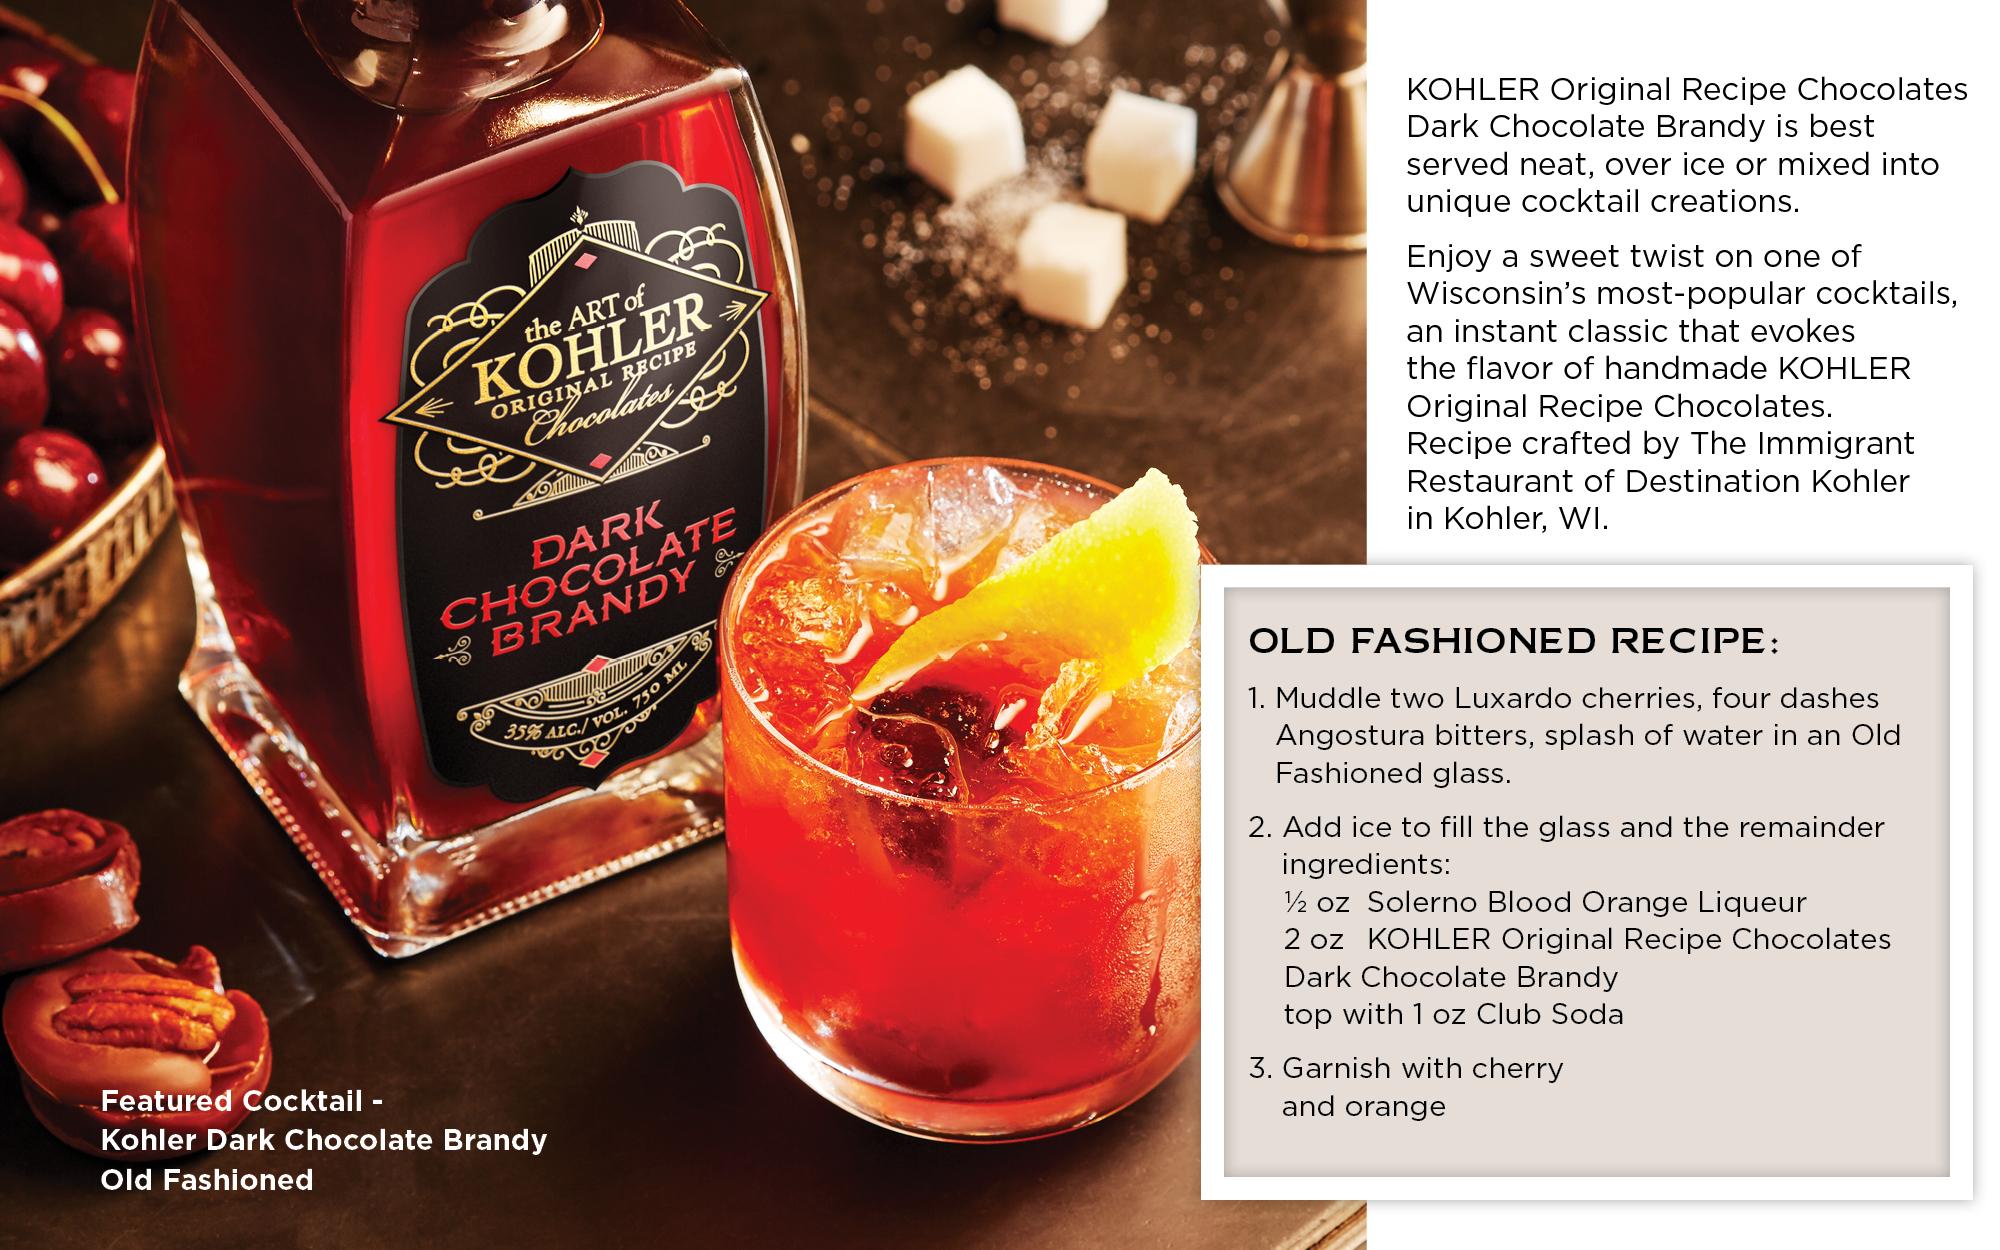 Kohler Original Recipe Dark Chocolate Brandy – Old Fashioned Recipe